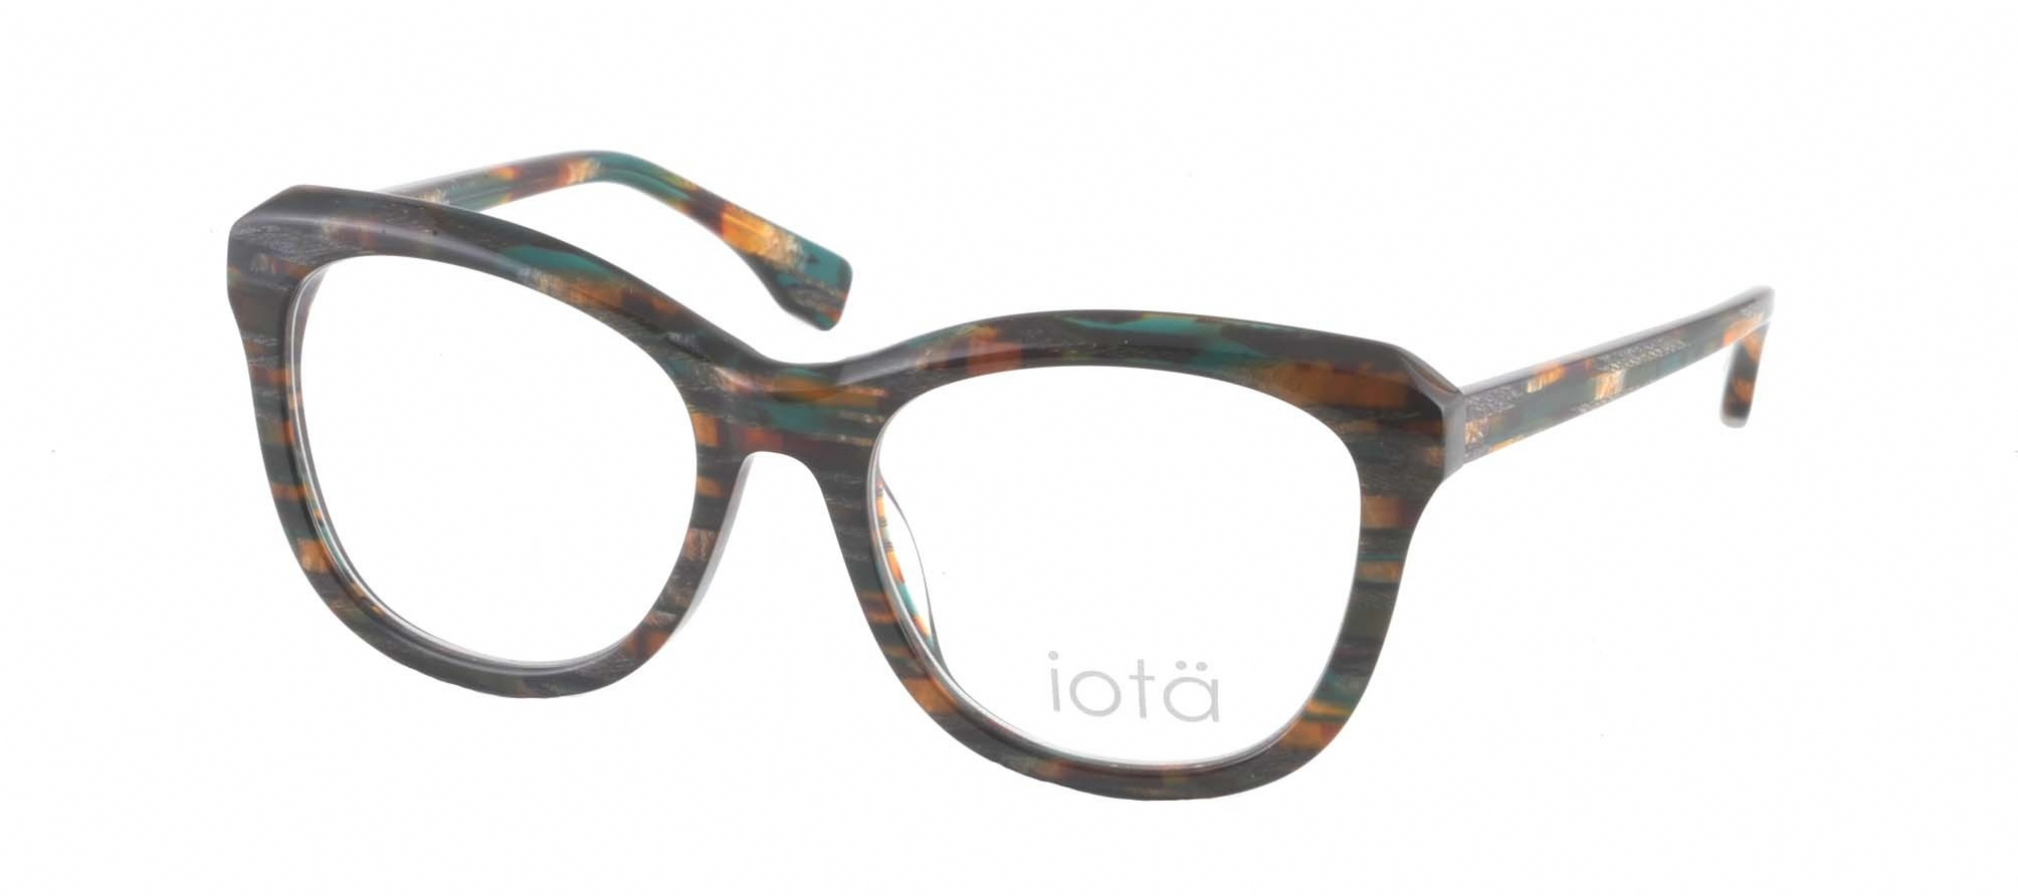 Dallas Green Glasses Frames : Iota Ah Eyeglasses